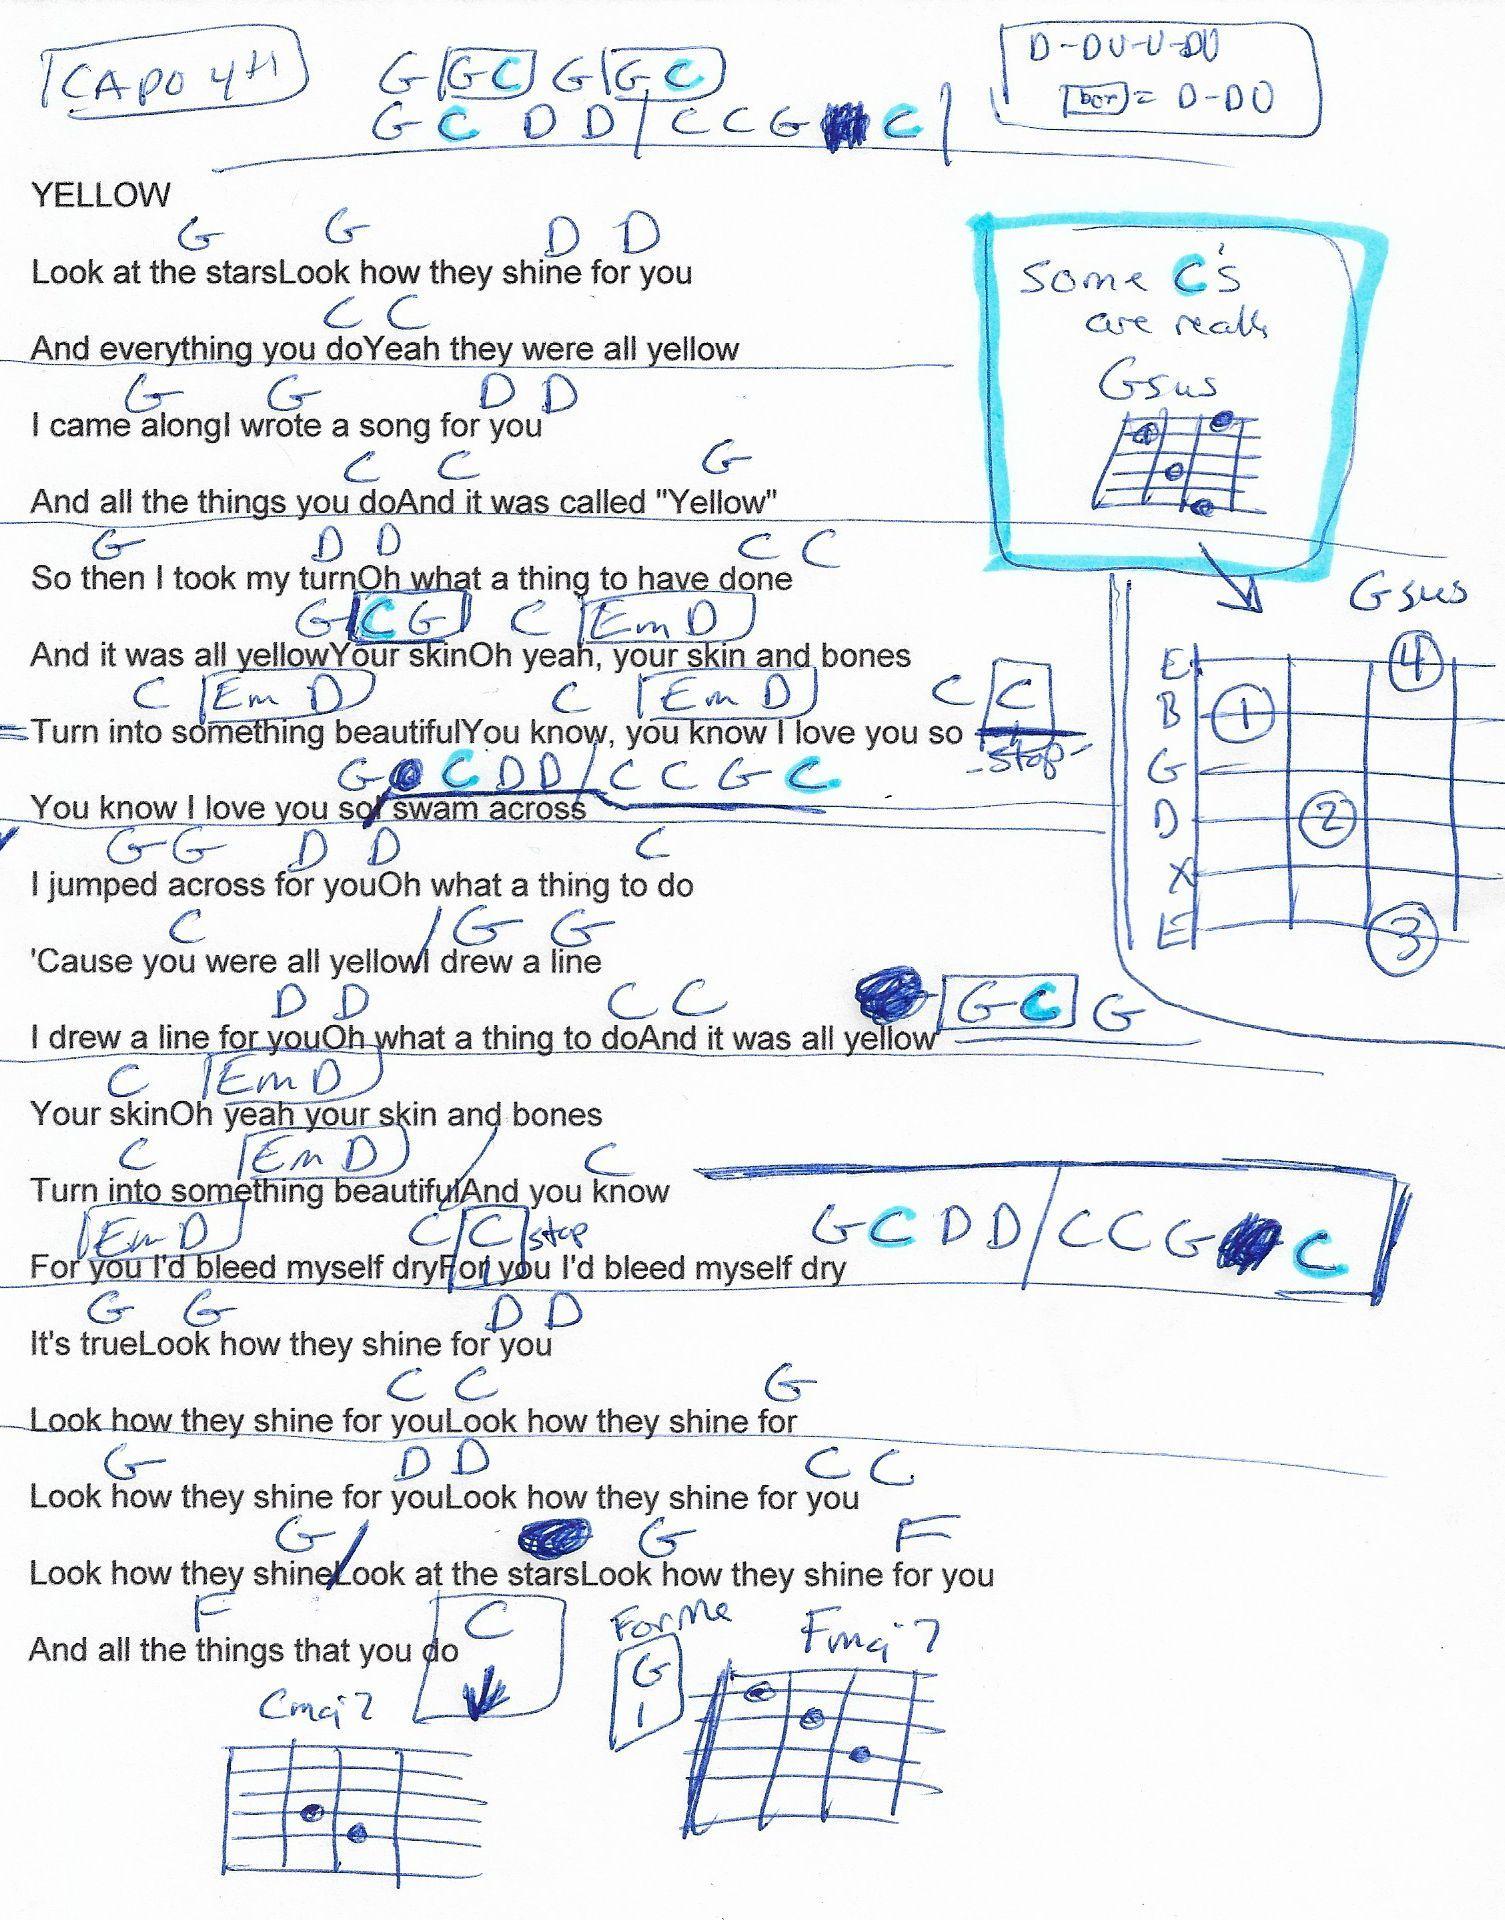 Yellow Coldplay Guitar Chord Chart Capo 4th Fret Guitar Chords For Songs Easy Guitar Songs Coldplay Chords